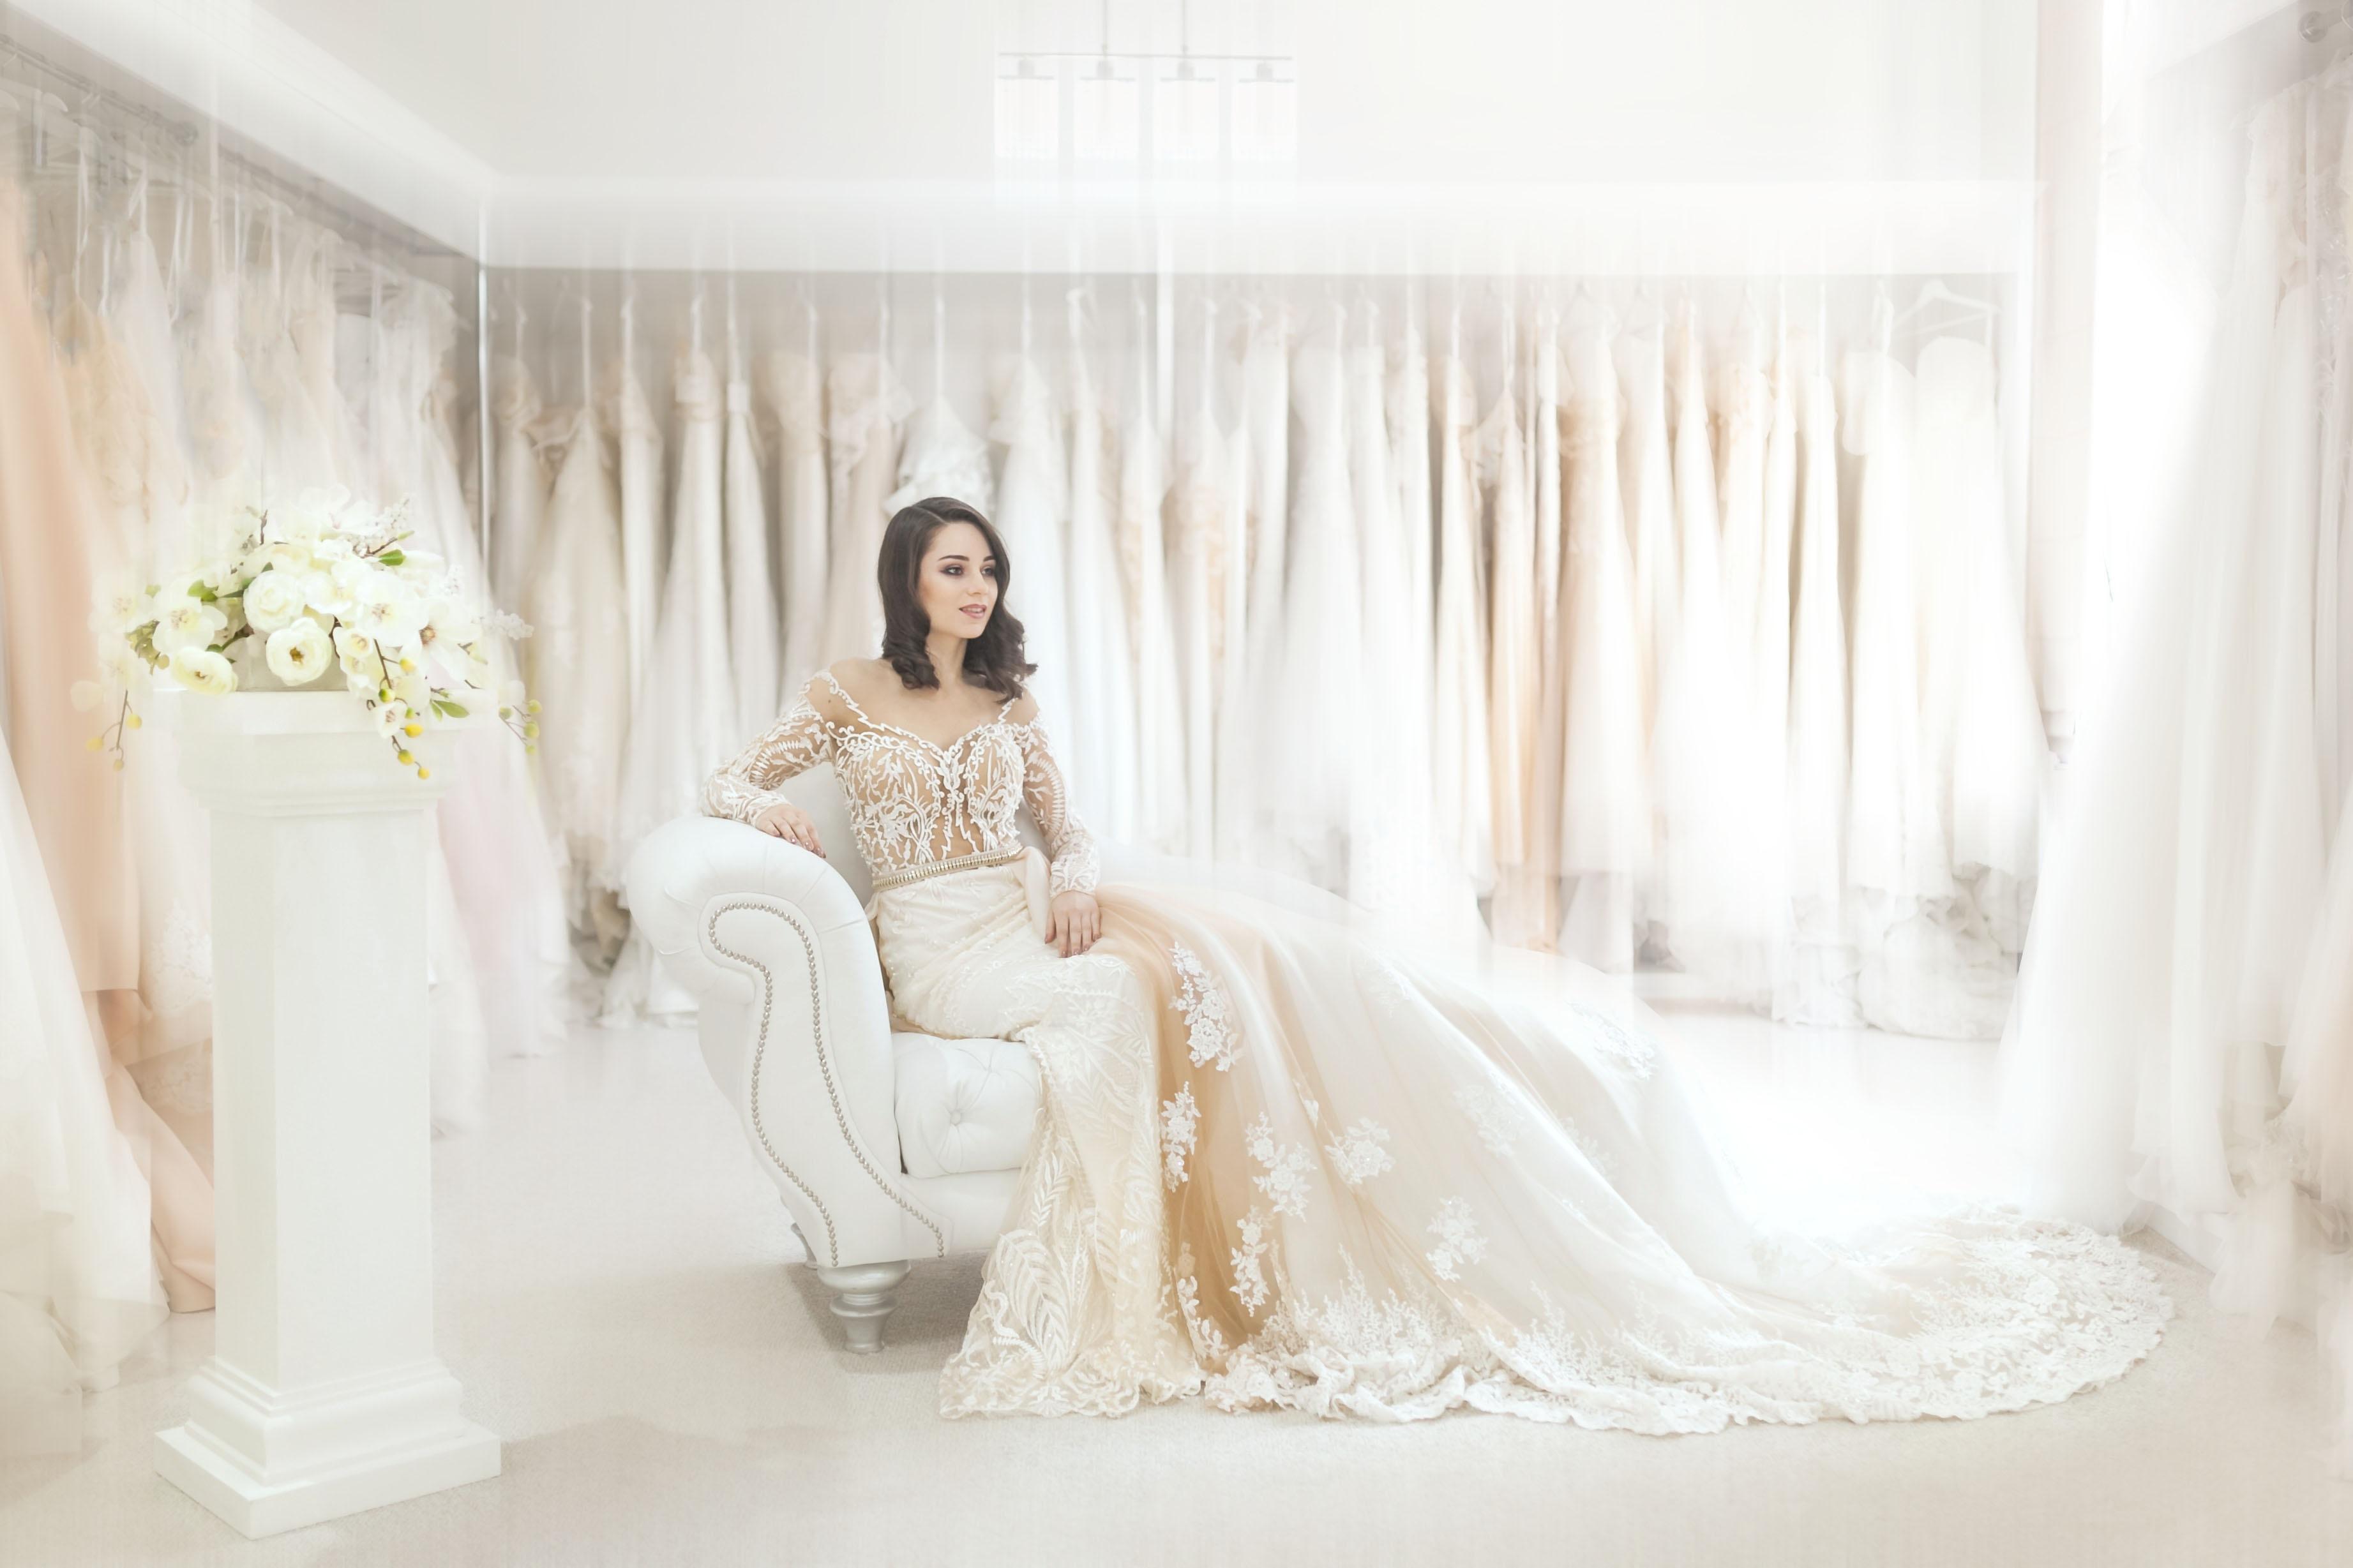 Bridesmaid Dresses Mn | Wedding Dresses St Cloud Mn Prom Store Mn